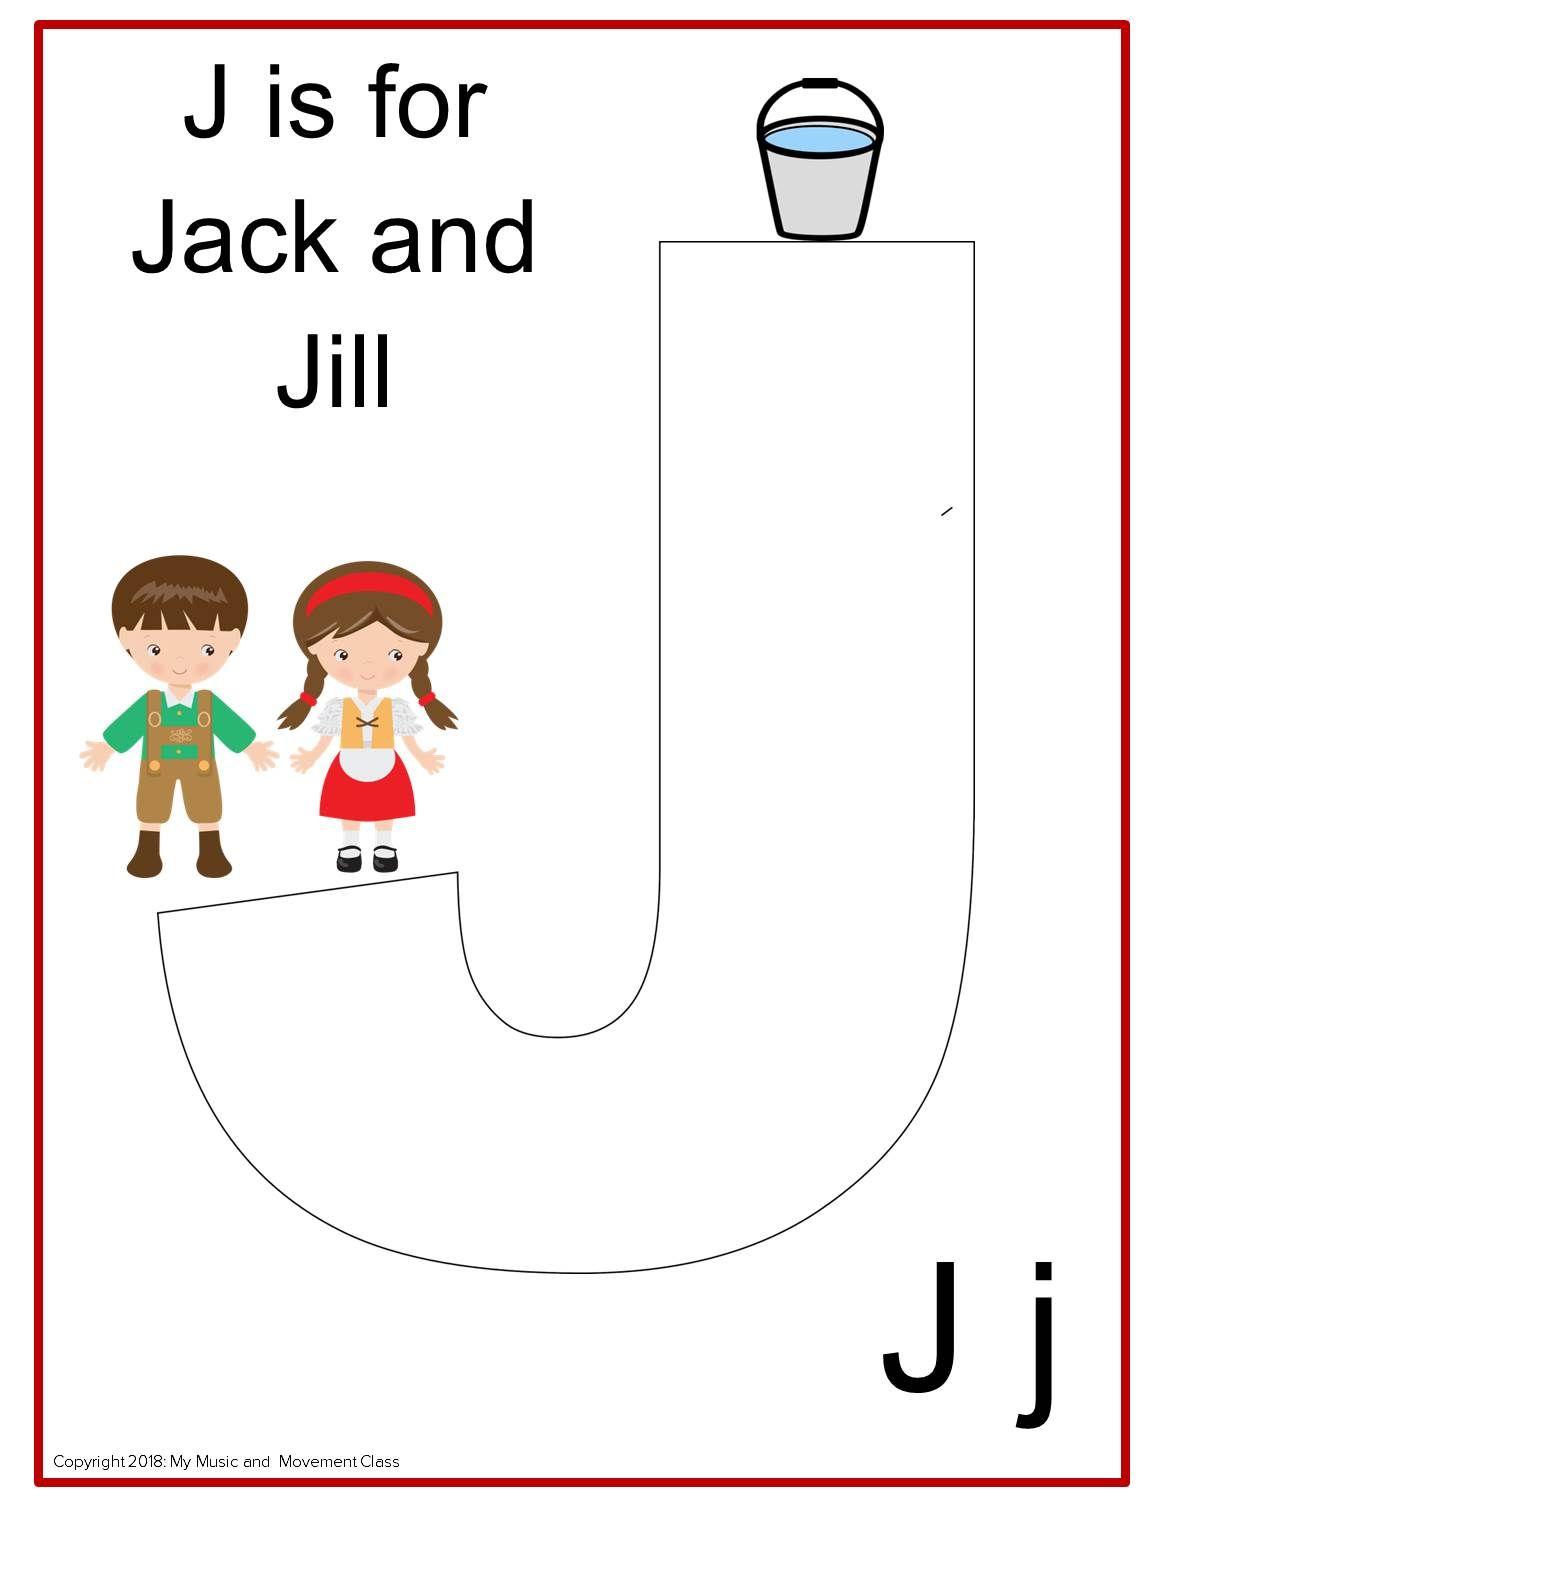 Jack And Jill Nursery Rhyme Music Activity Music And Movement Music And Movement Music Activities Jack And Jill